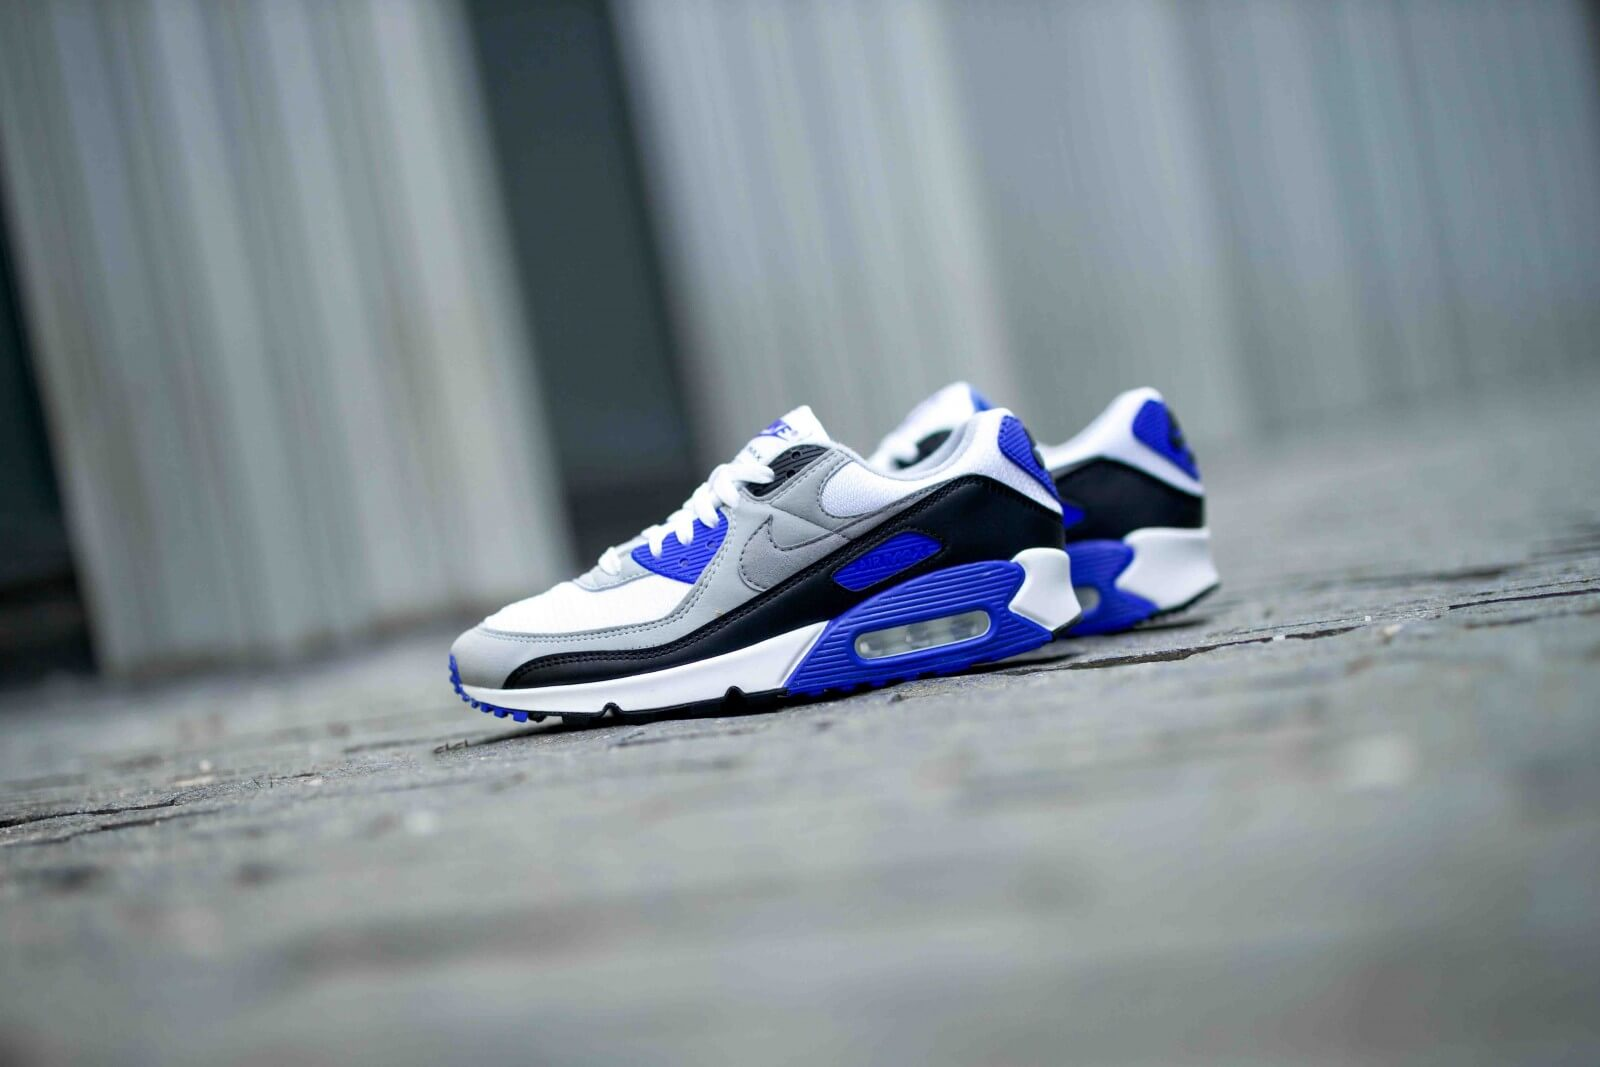 Nike Air Max 90 WhiteParticle Grey Royal Blue CD0881 102